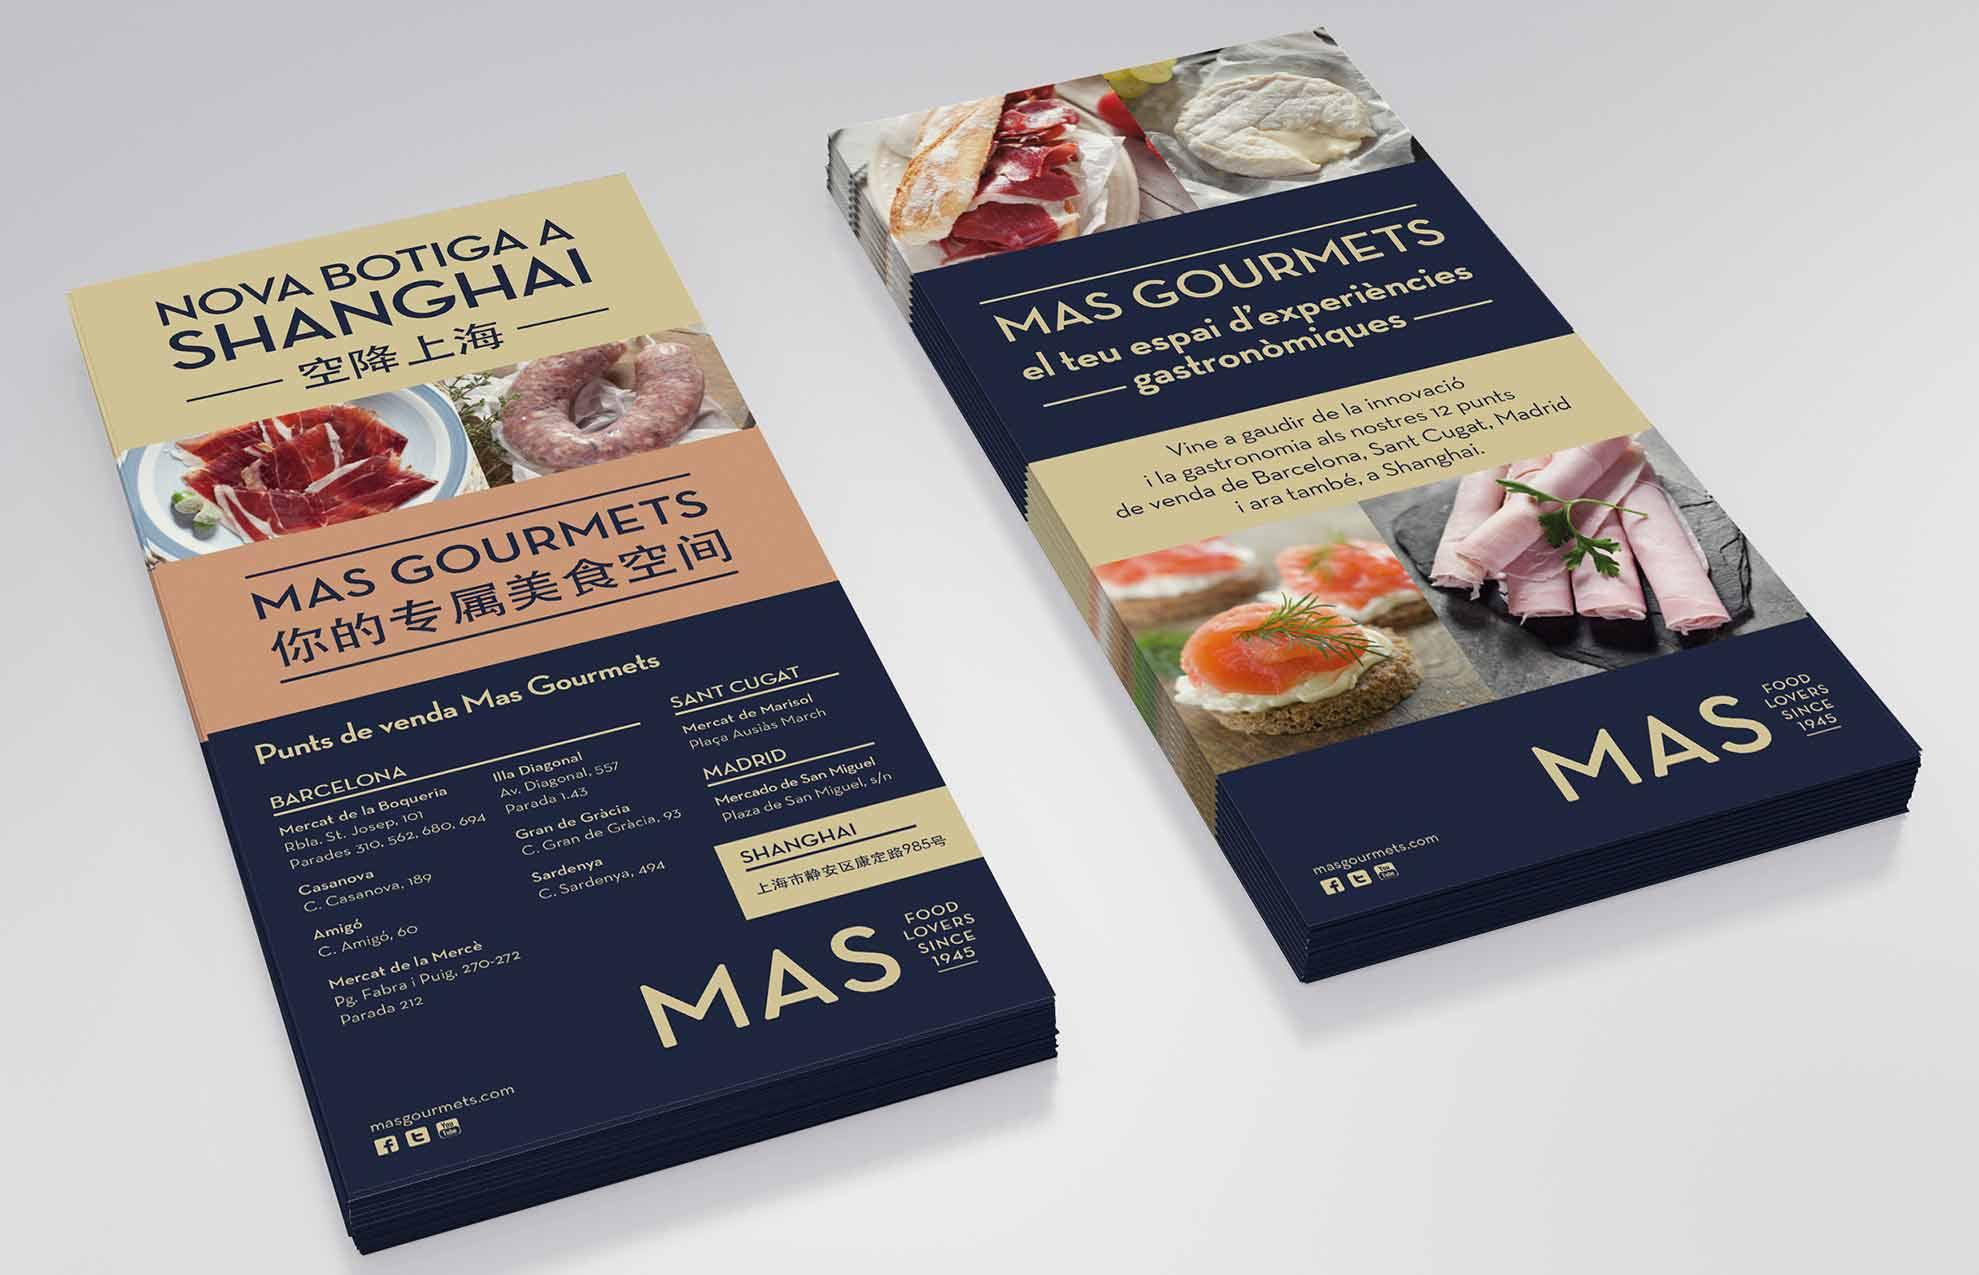 flyer promocional para china - Estrategia en branding y comunicación comercial para exportar a China